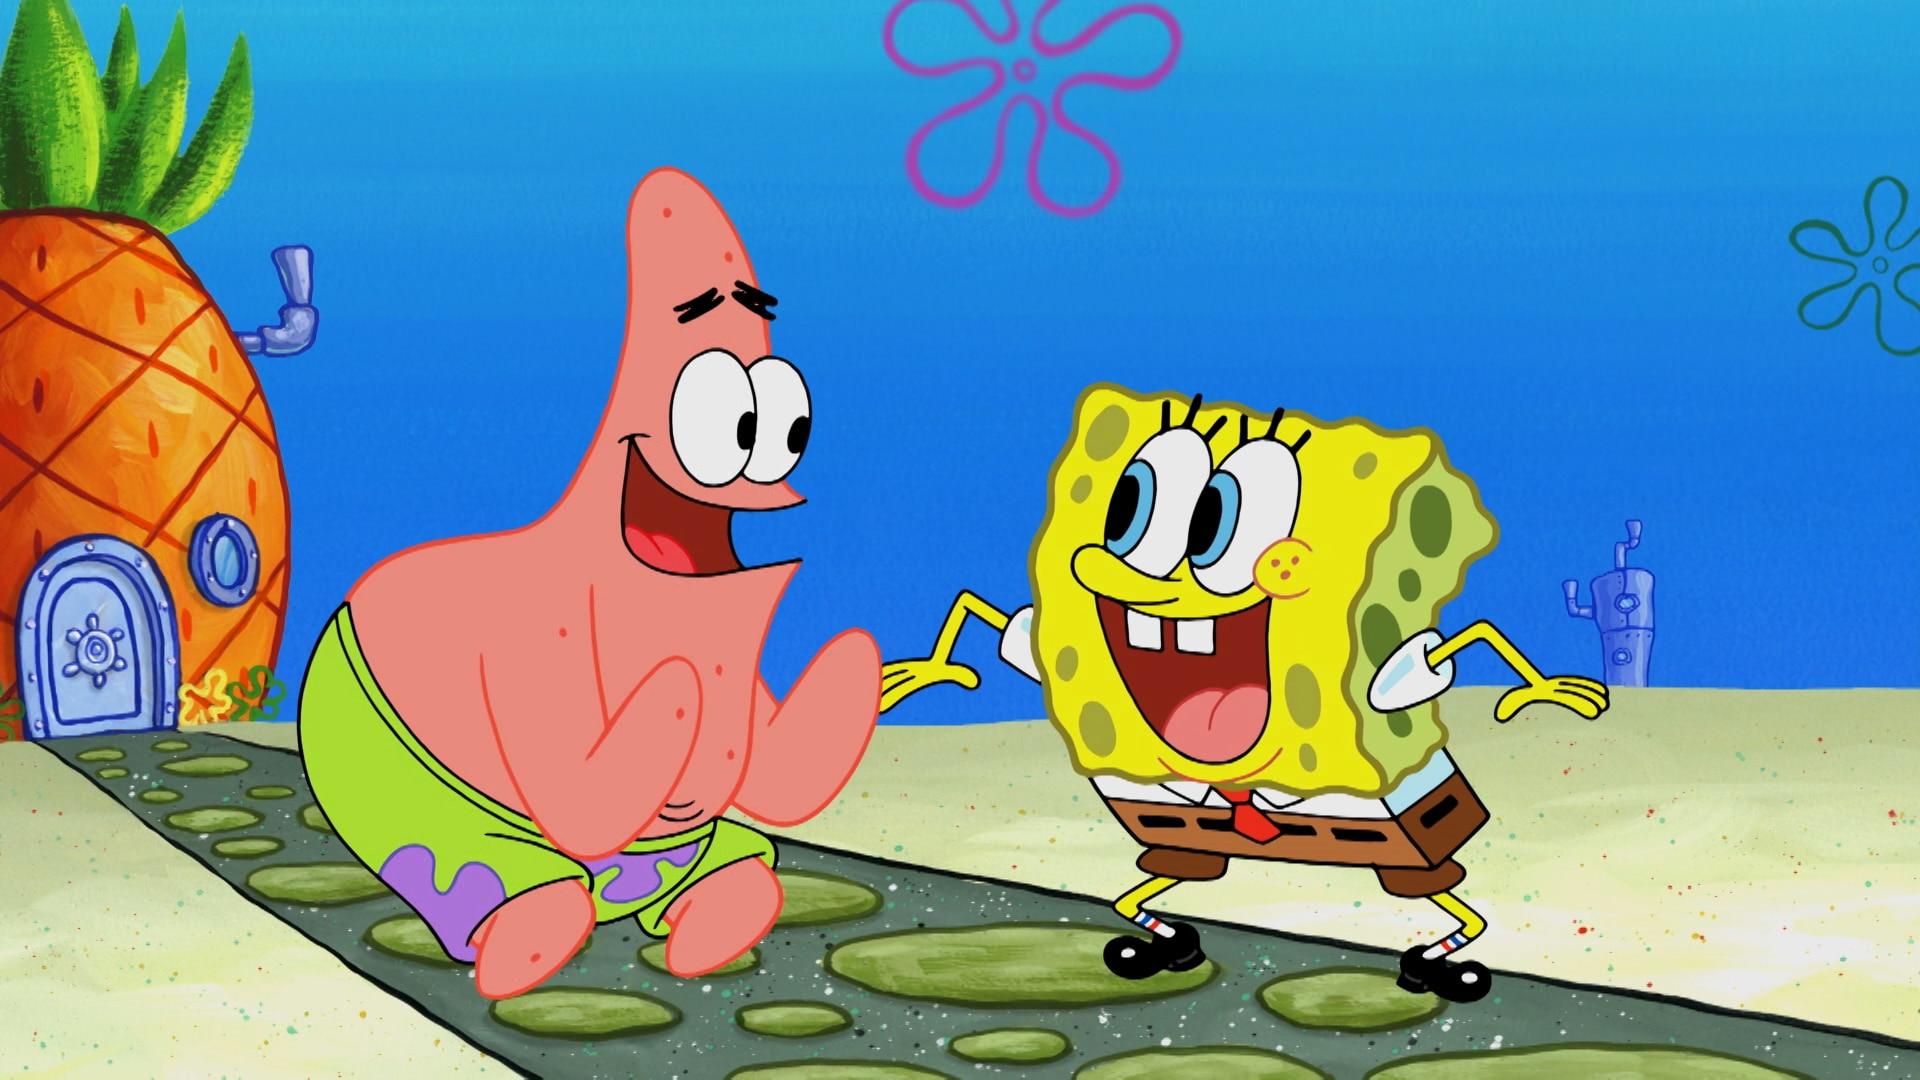 spongebob squarepants sky